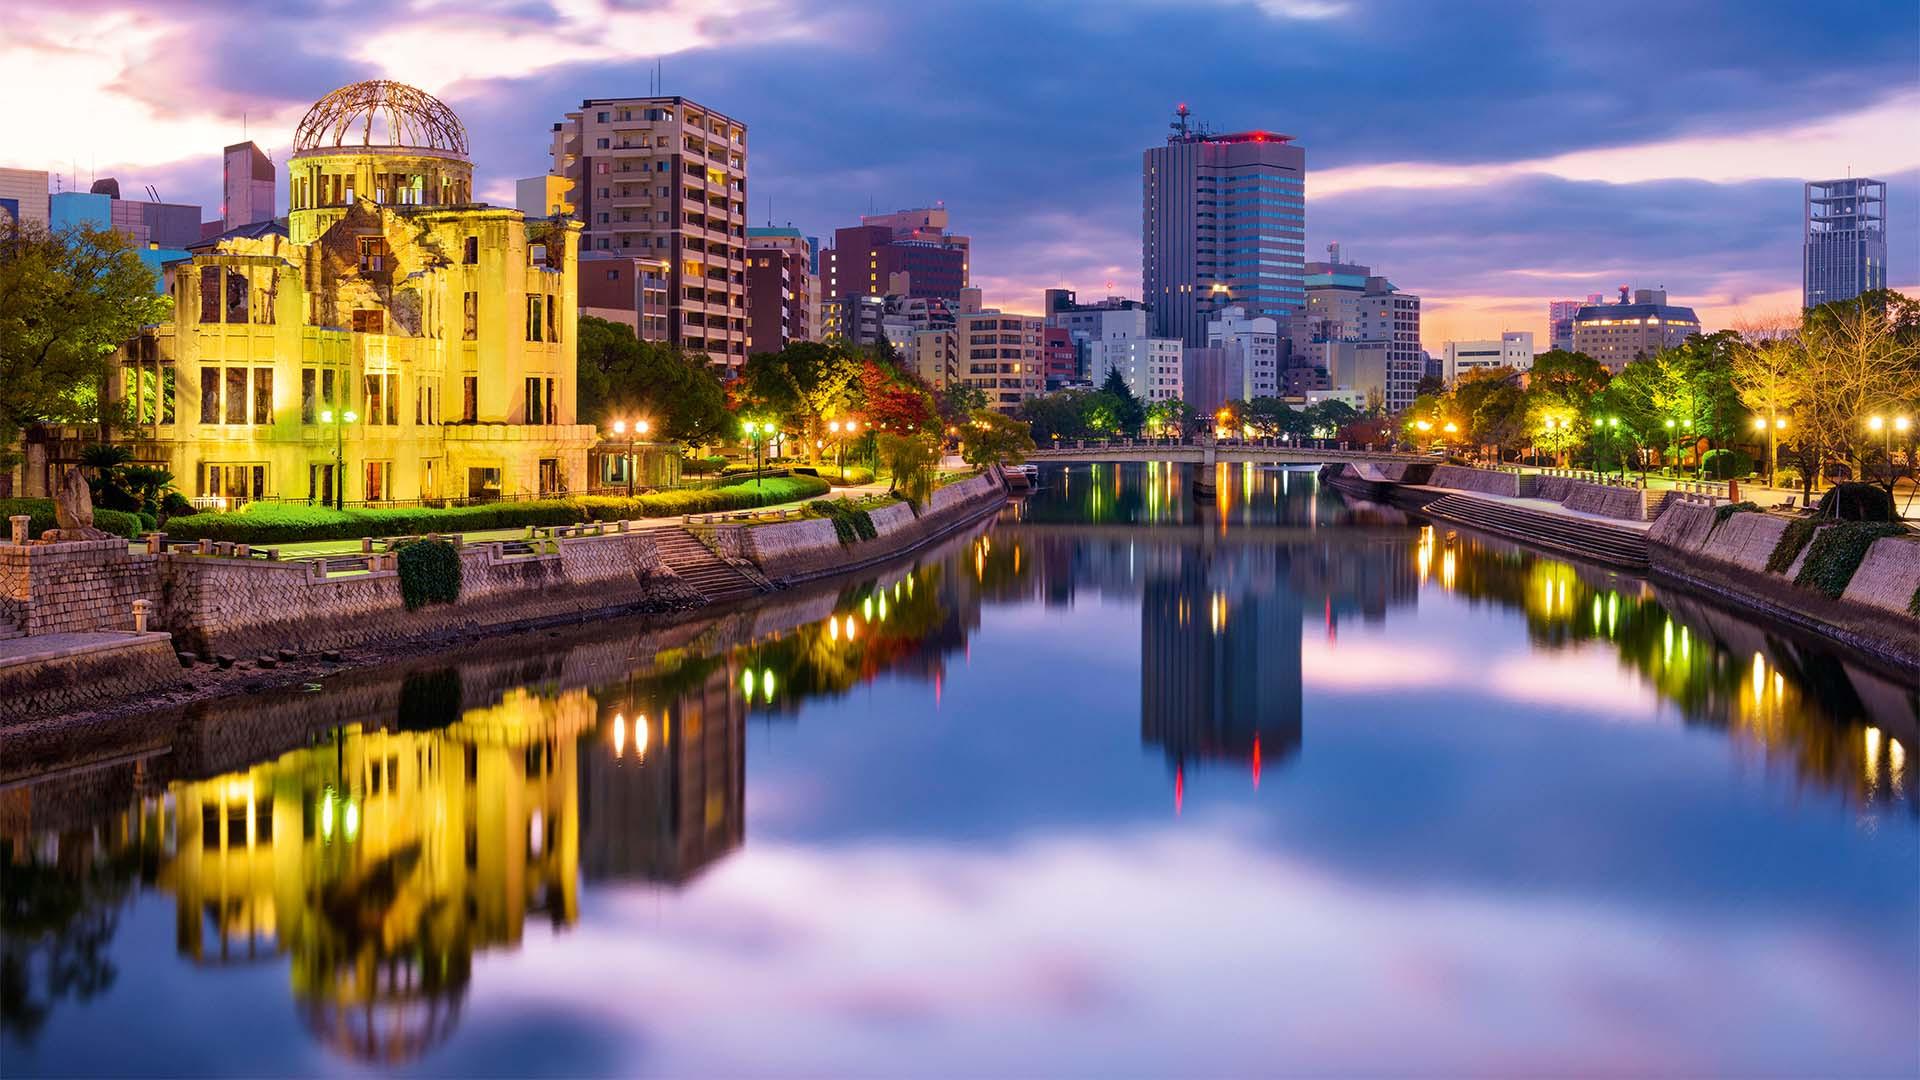 The river and Peace Memorial at Hiroshima